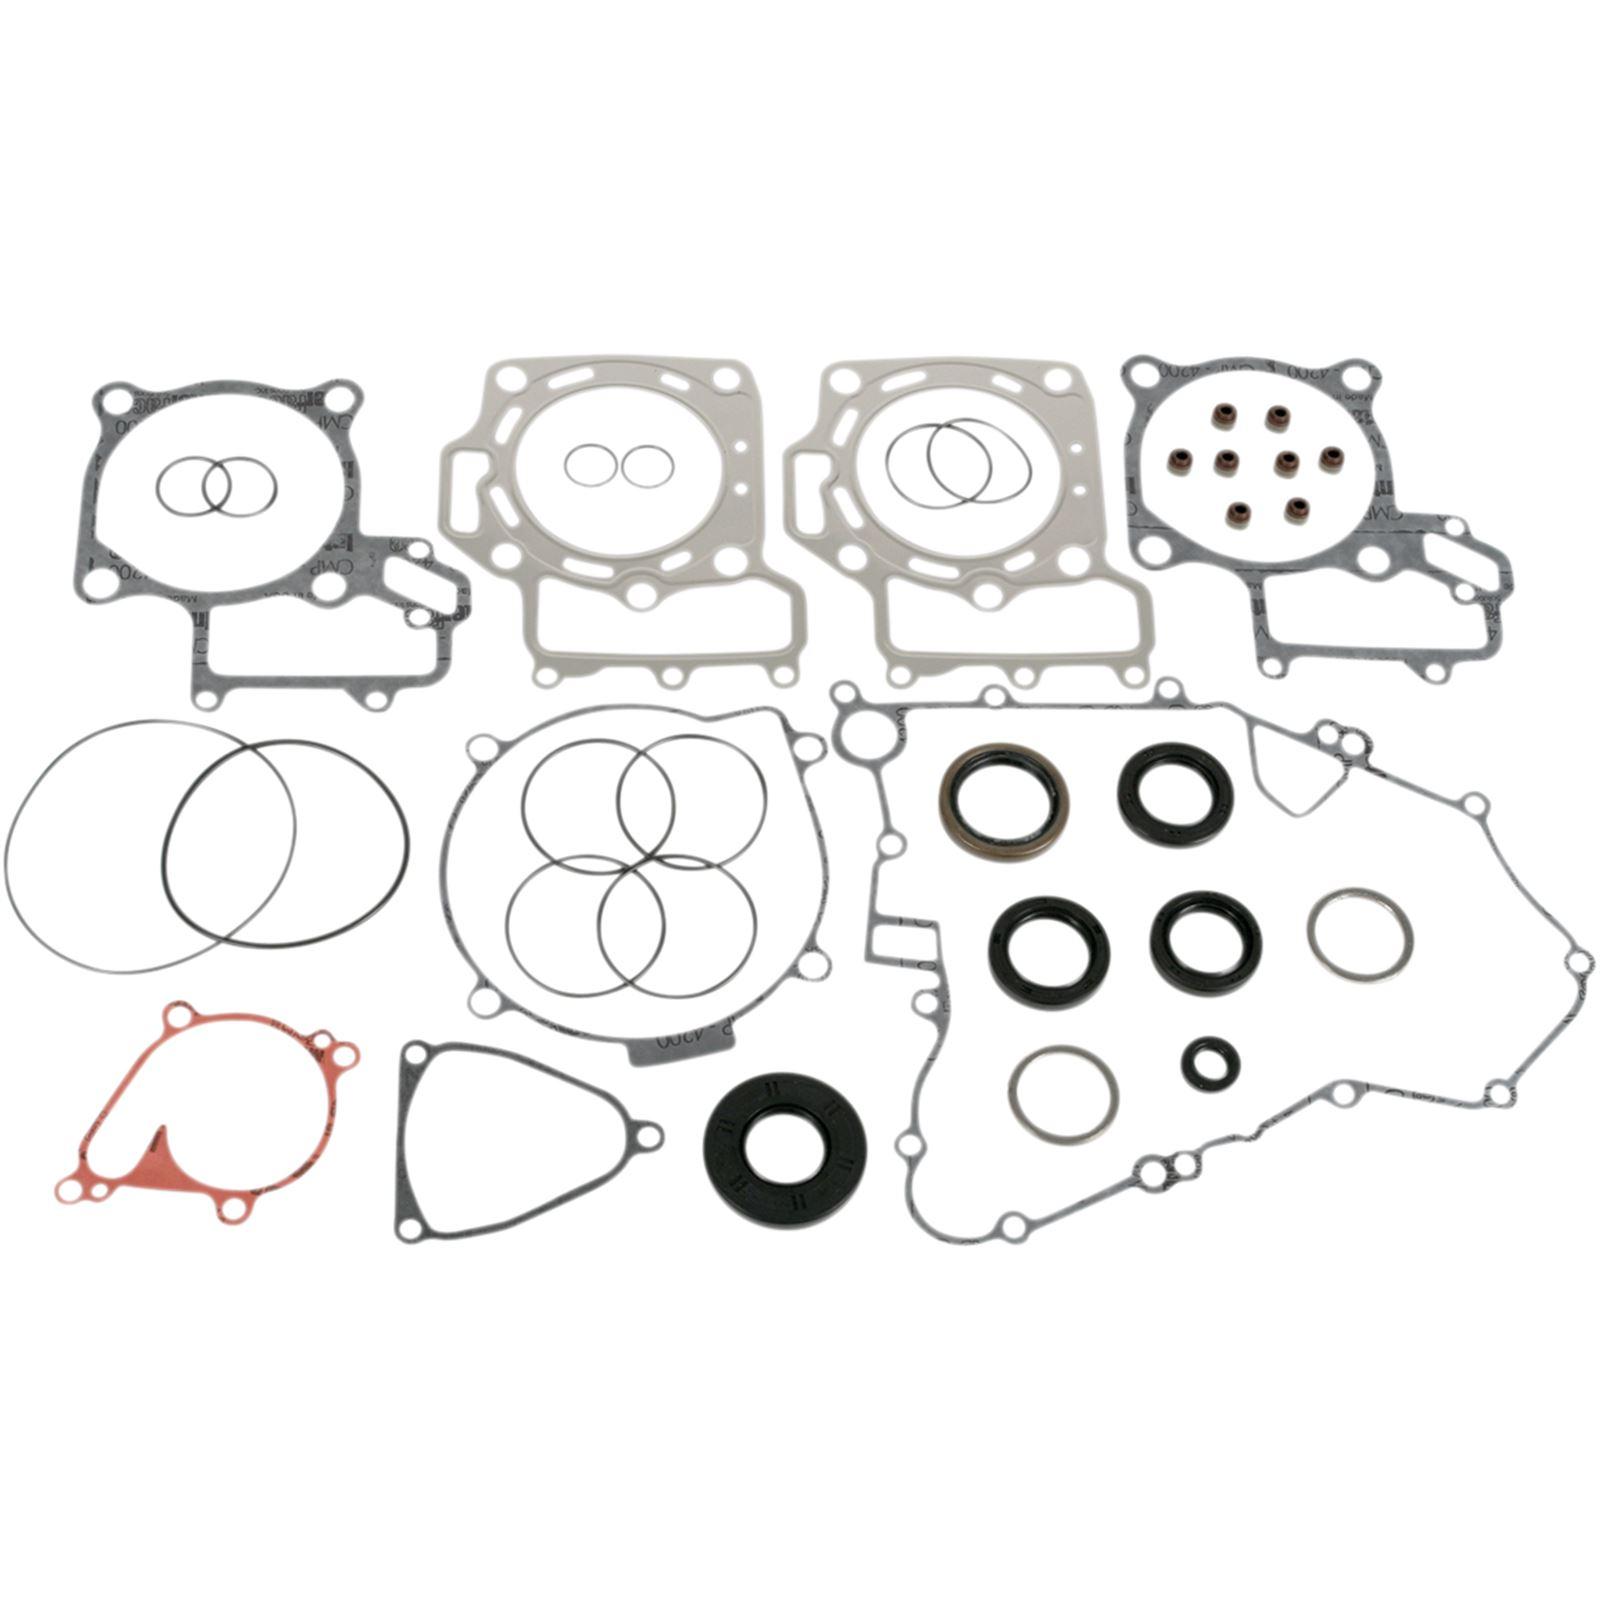 Moose Racing Motor Gasket Kit with Seal Kawasaki